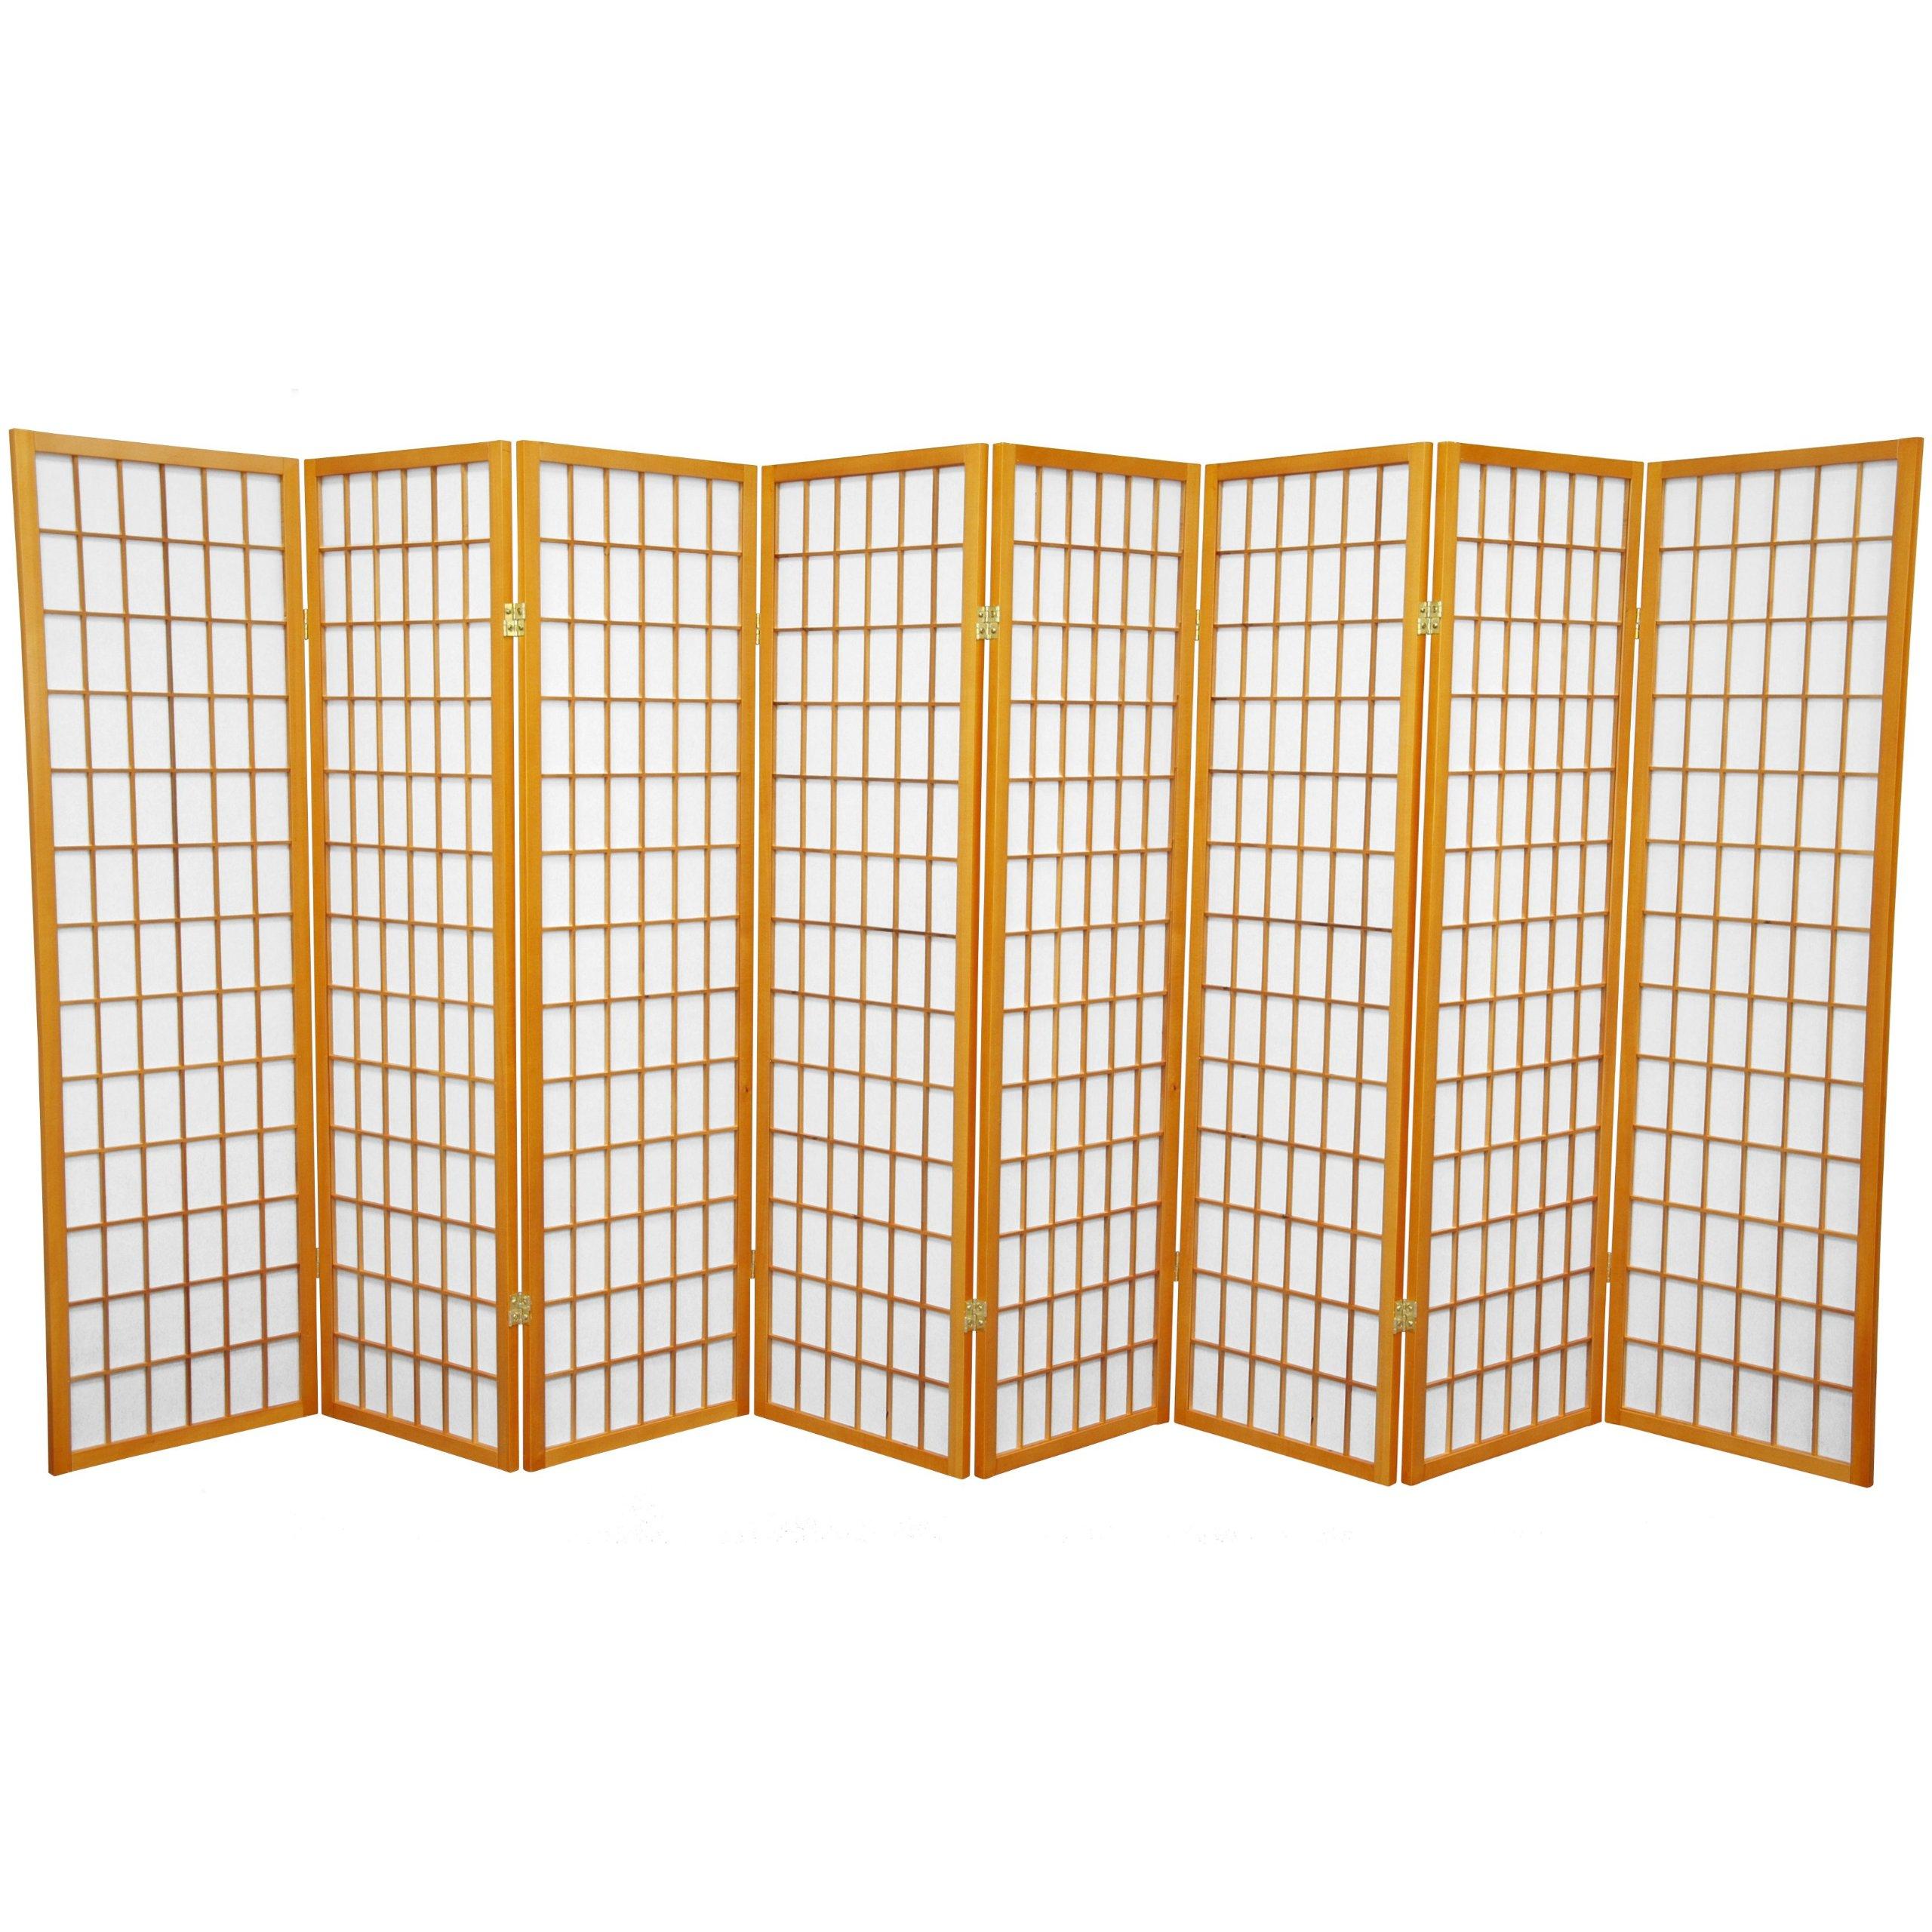 Oriental Furniture 5 ft. Tall Window Pane Shoji Screen - Honey - 8 Panels